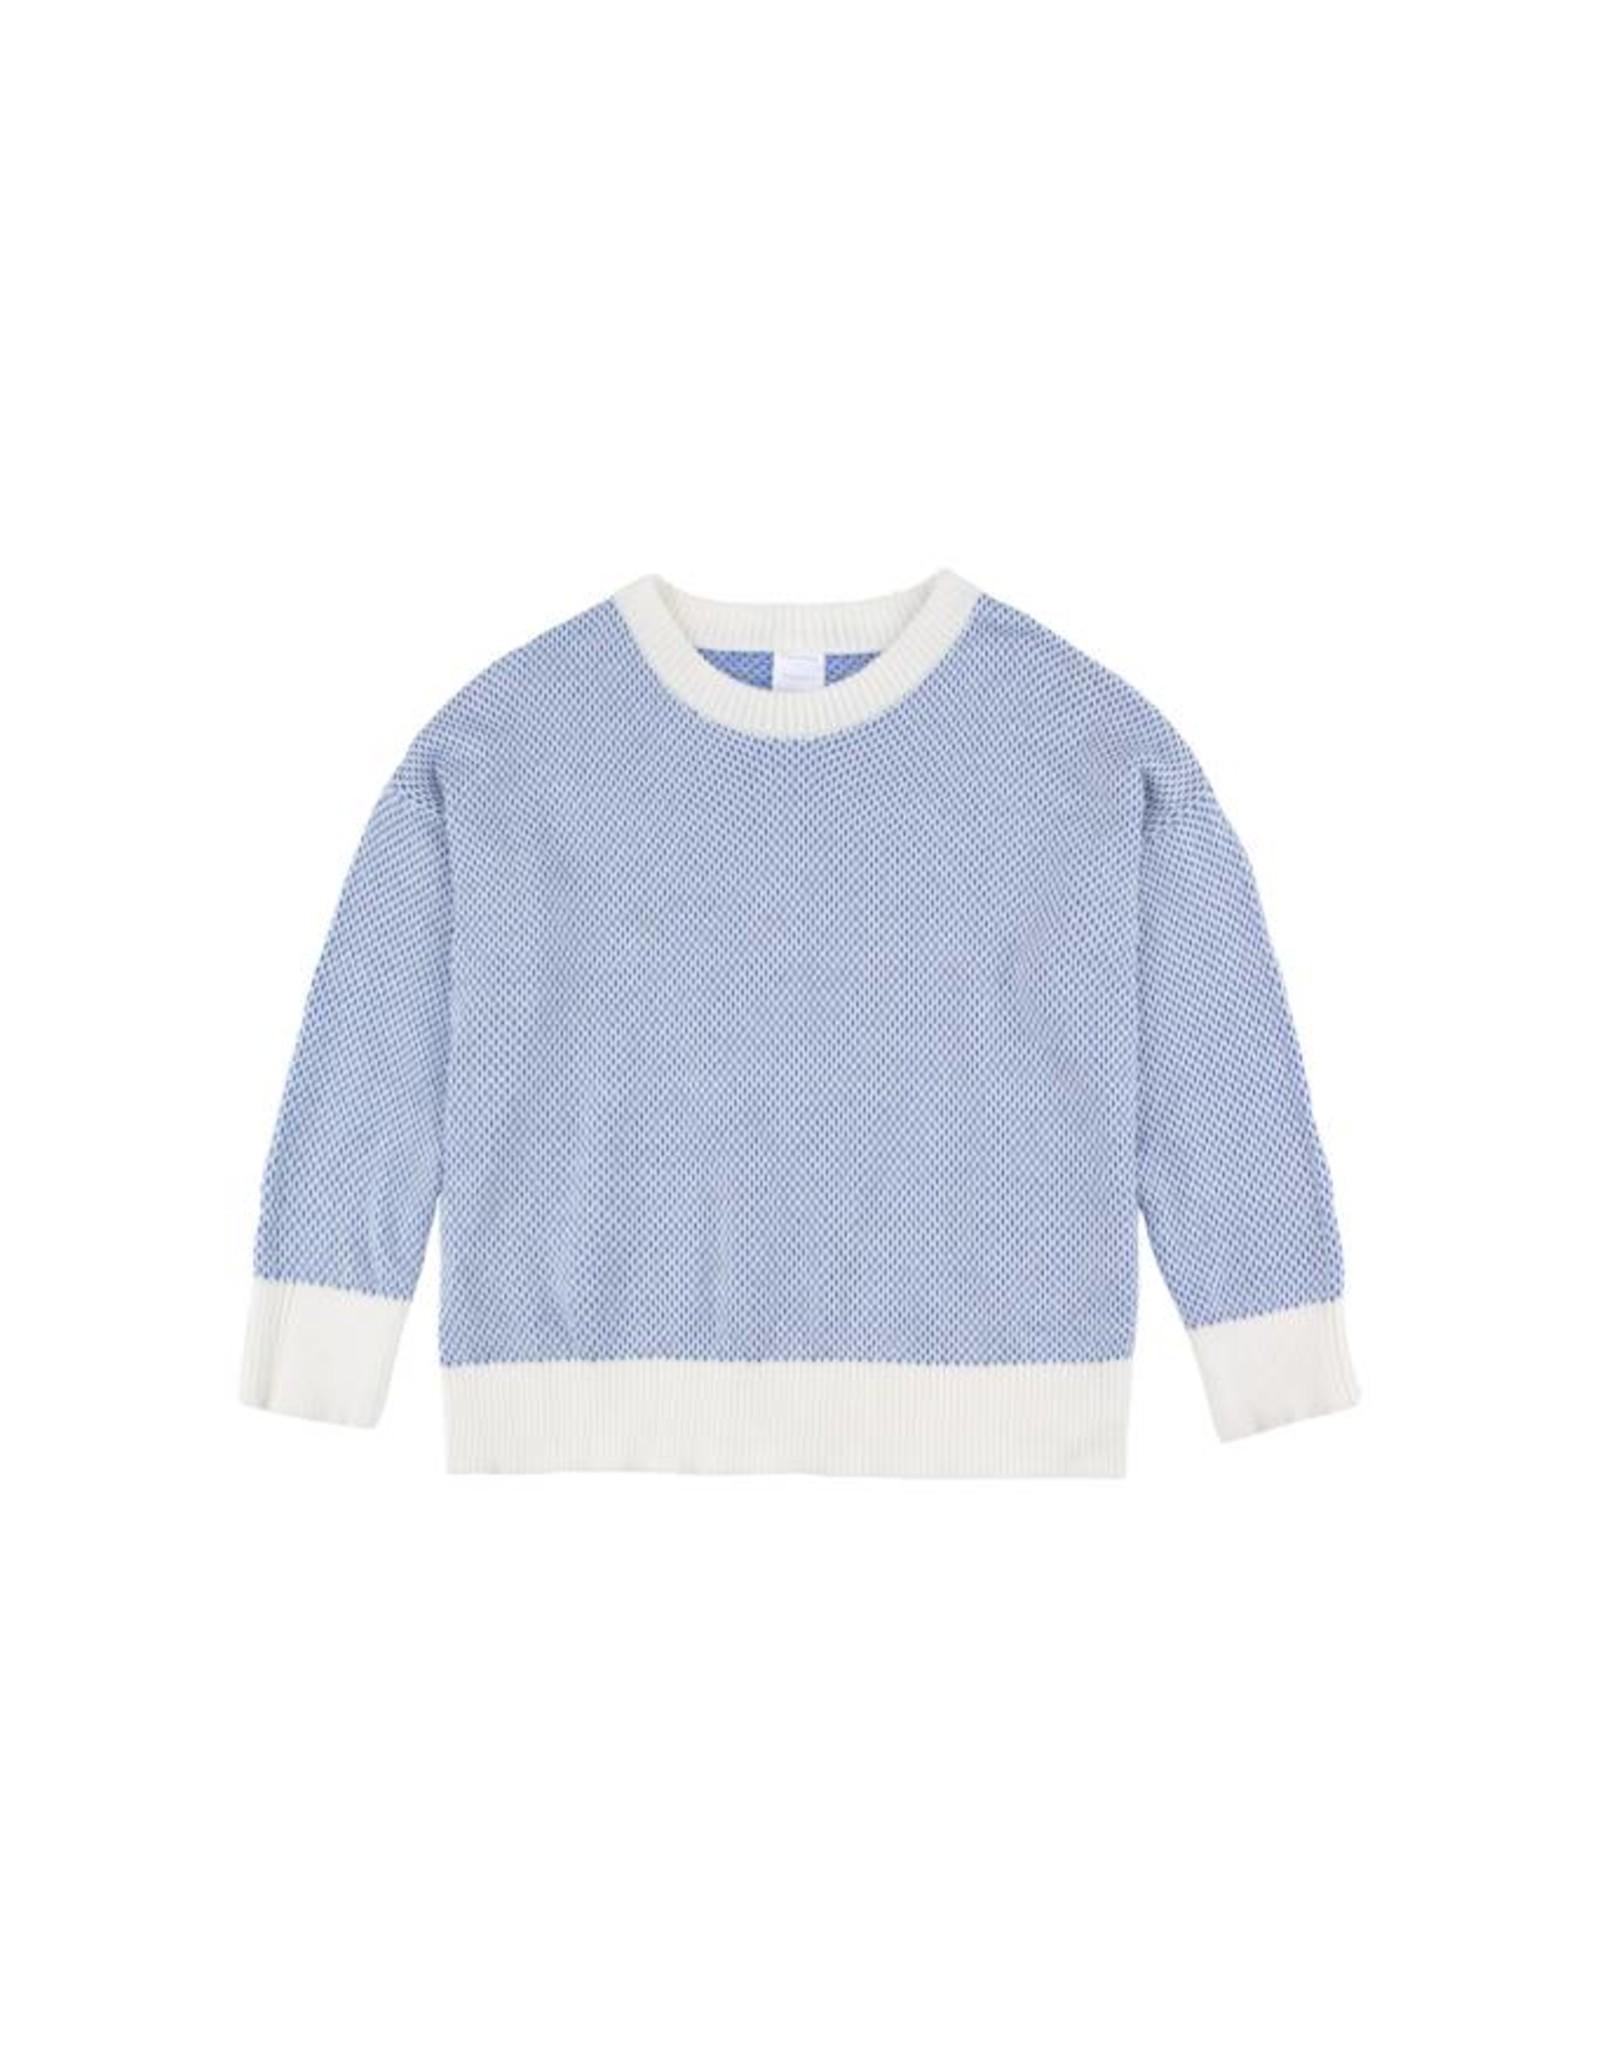 Sticks sweater